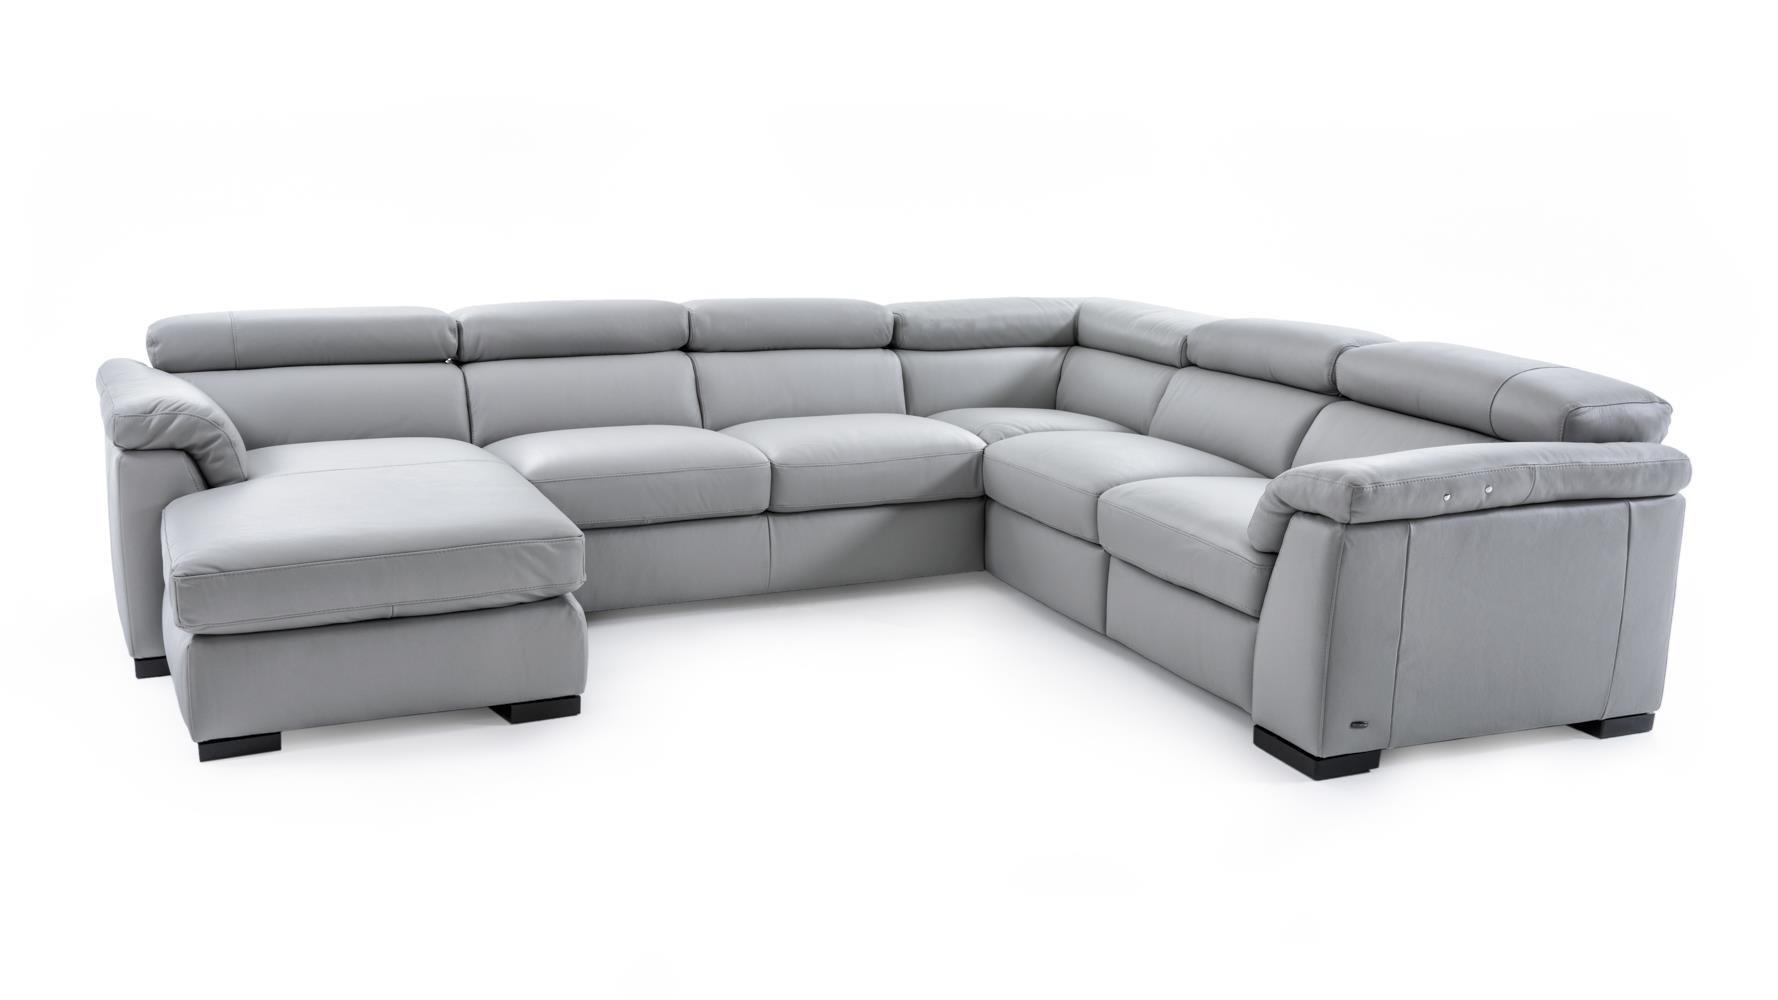 Merveilleux Natuzzi Editions B634Sectional Sofa W/ Power Recline ...